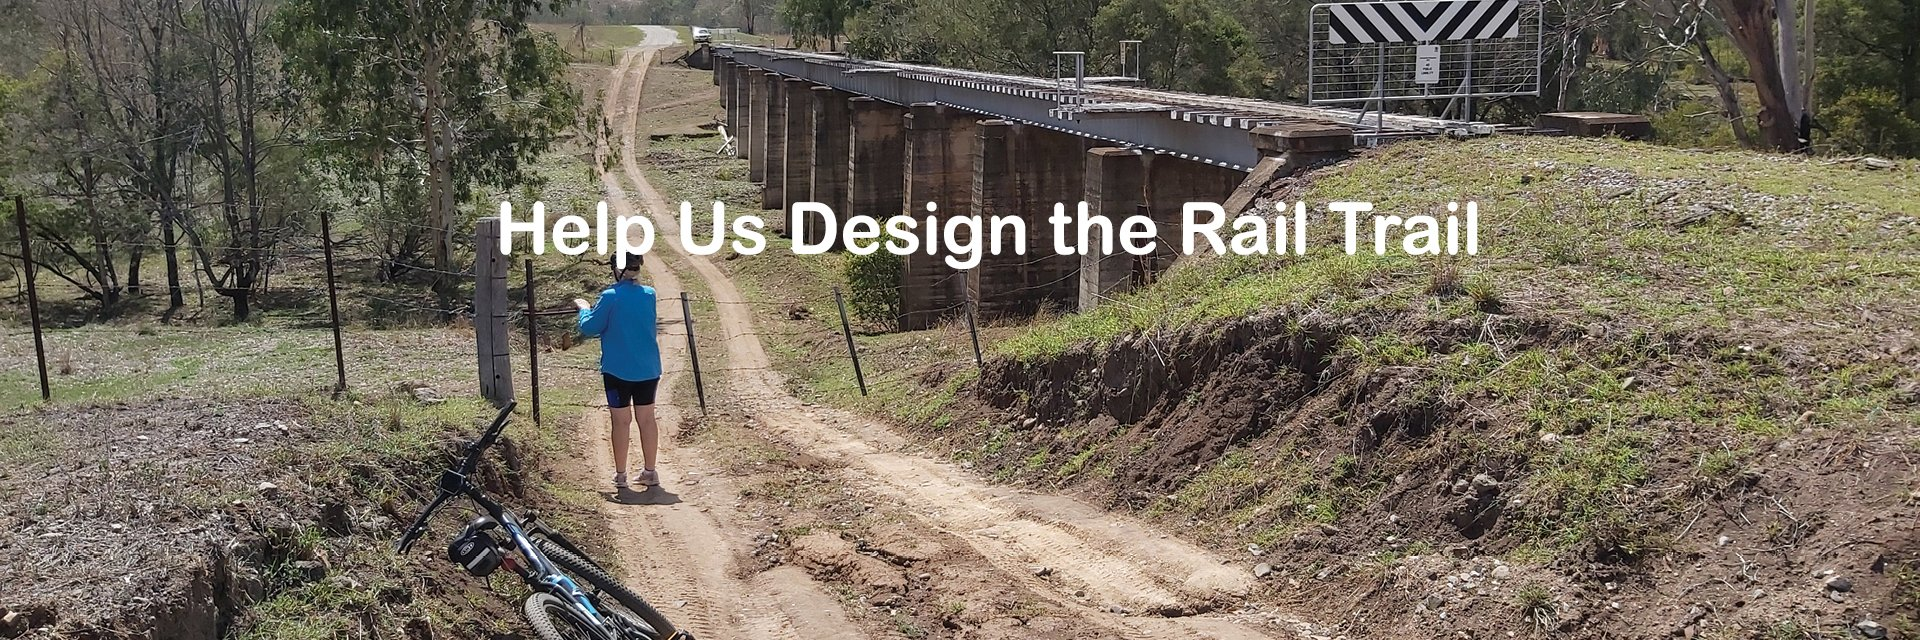 cyclist opening gate near railway bridge with writing help us design the rail trail